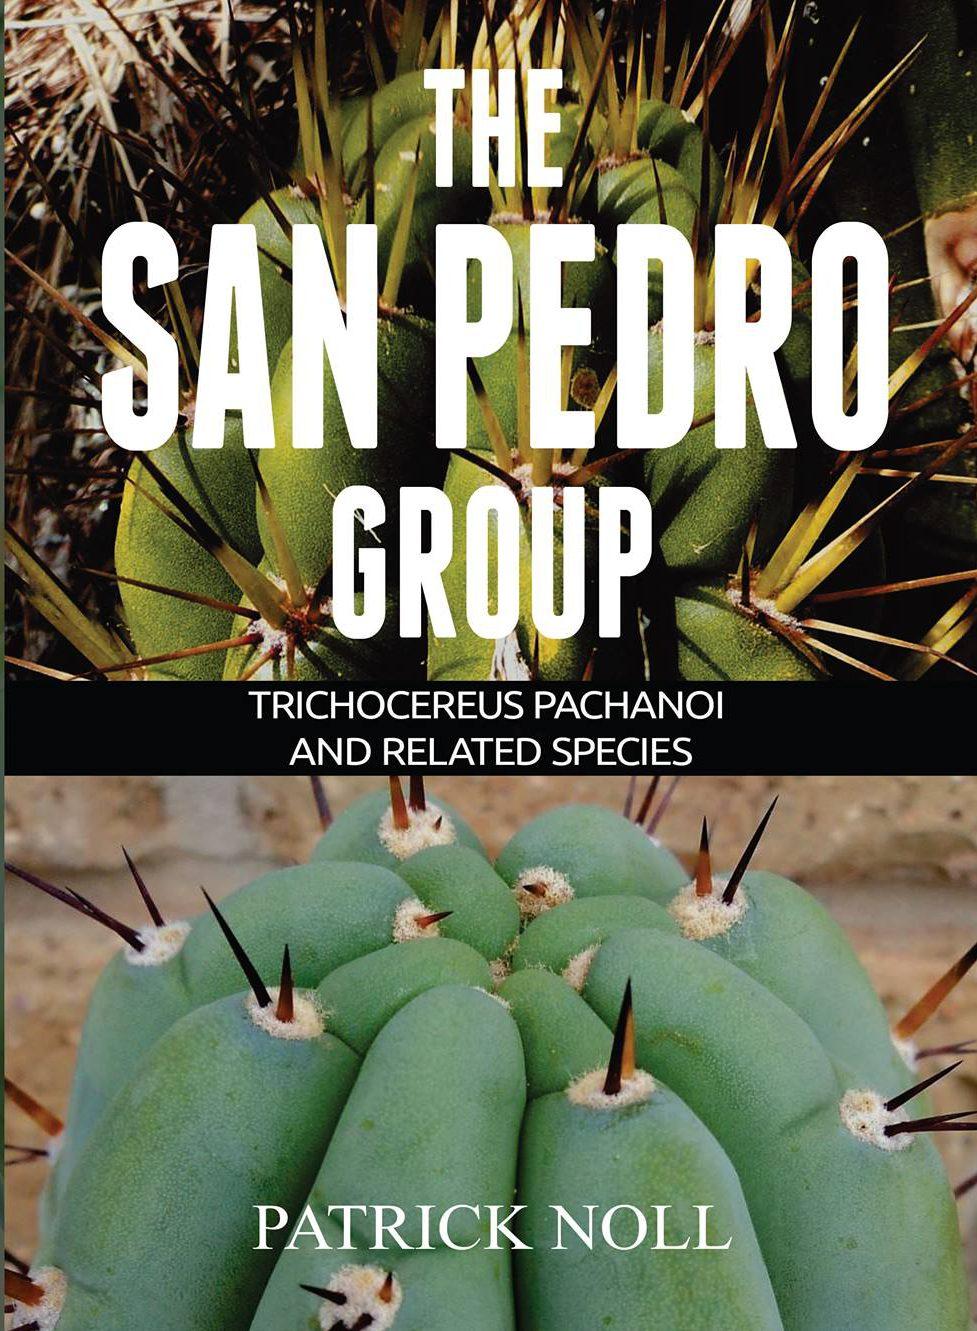 THE SAN PEDRO GROUP Book Trichocereus